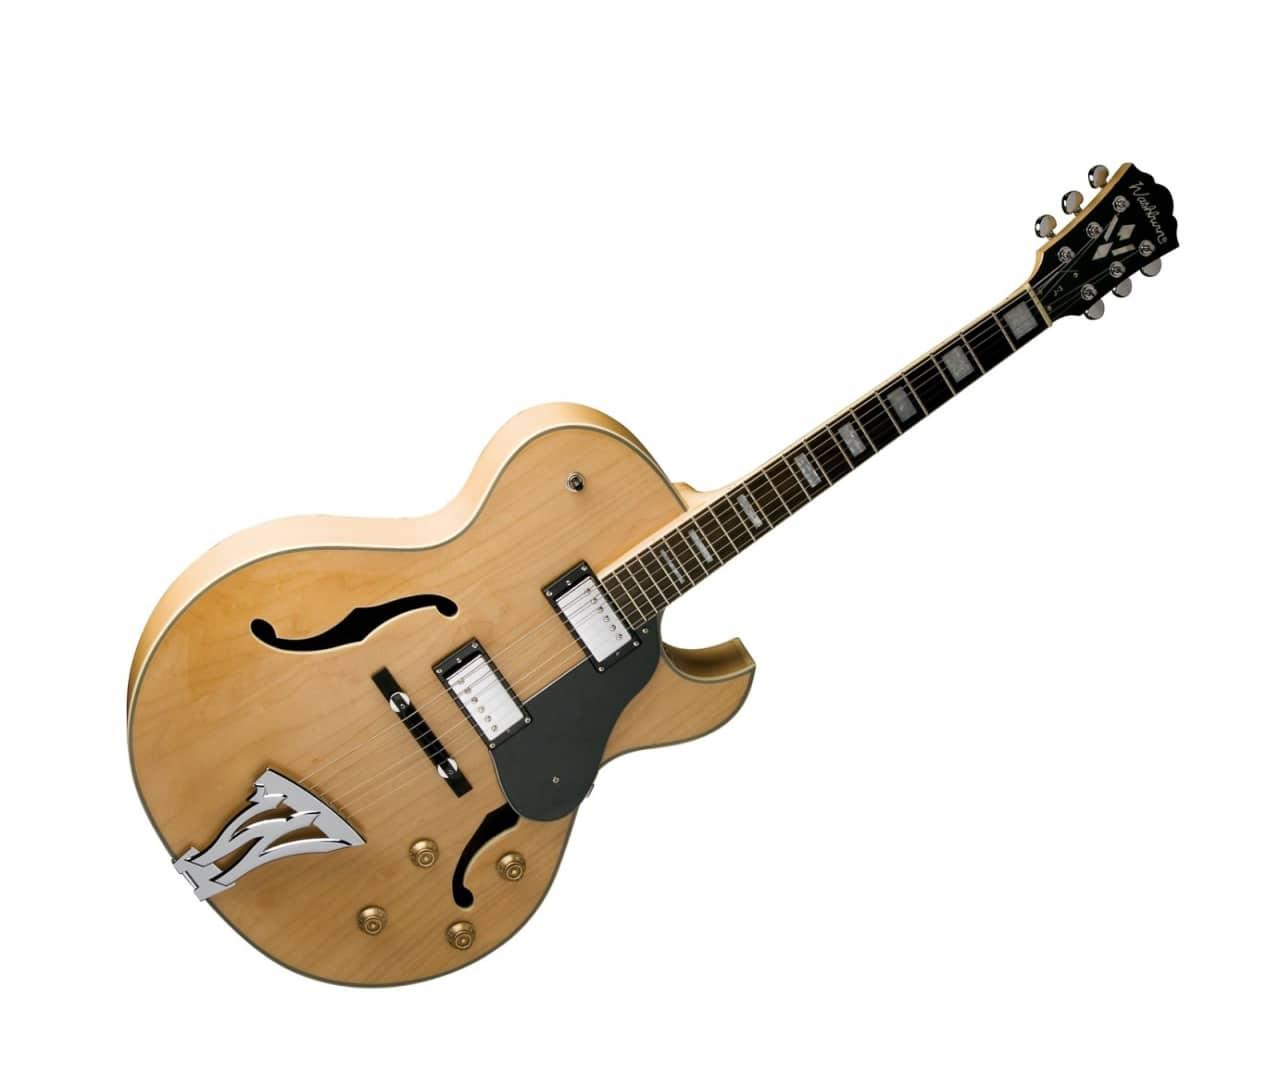 washburn electric hollowbody jazz guitar w hard case reverb. Black Bedroom Furniture Sets. Home Design Ideas